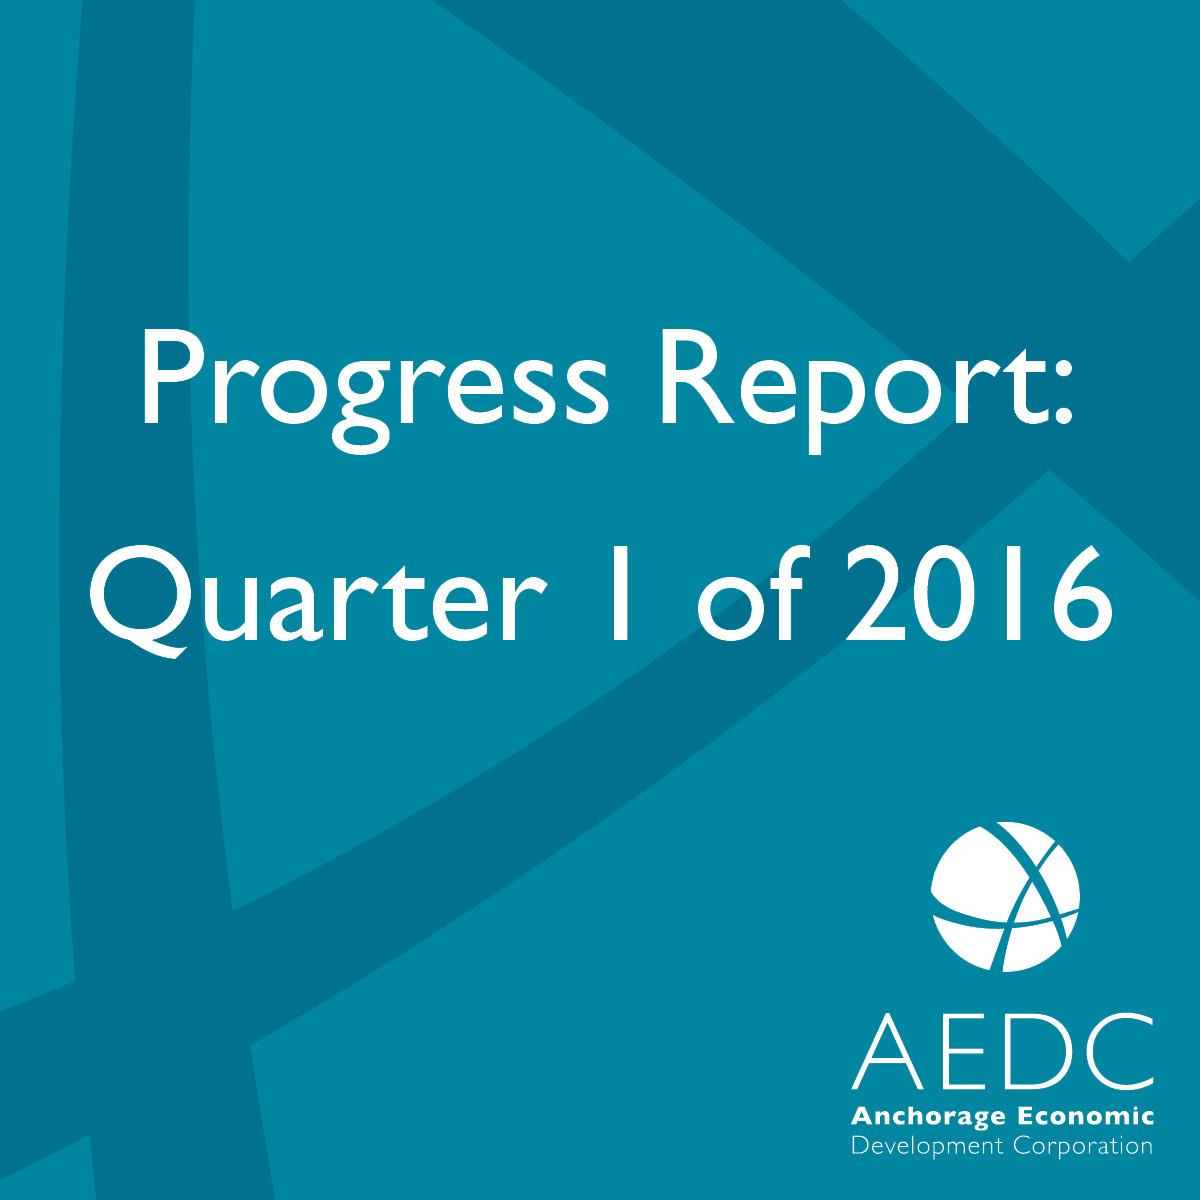 AEDC Progress Report: 2016 Q1